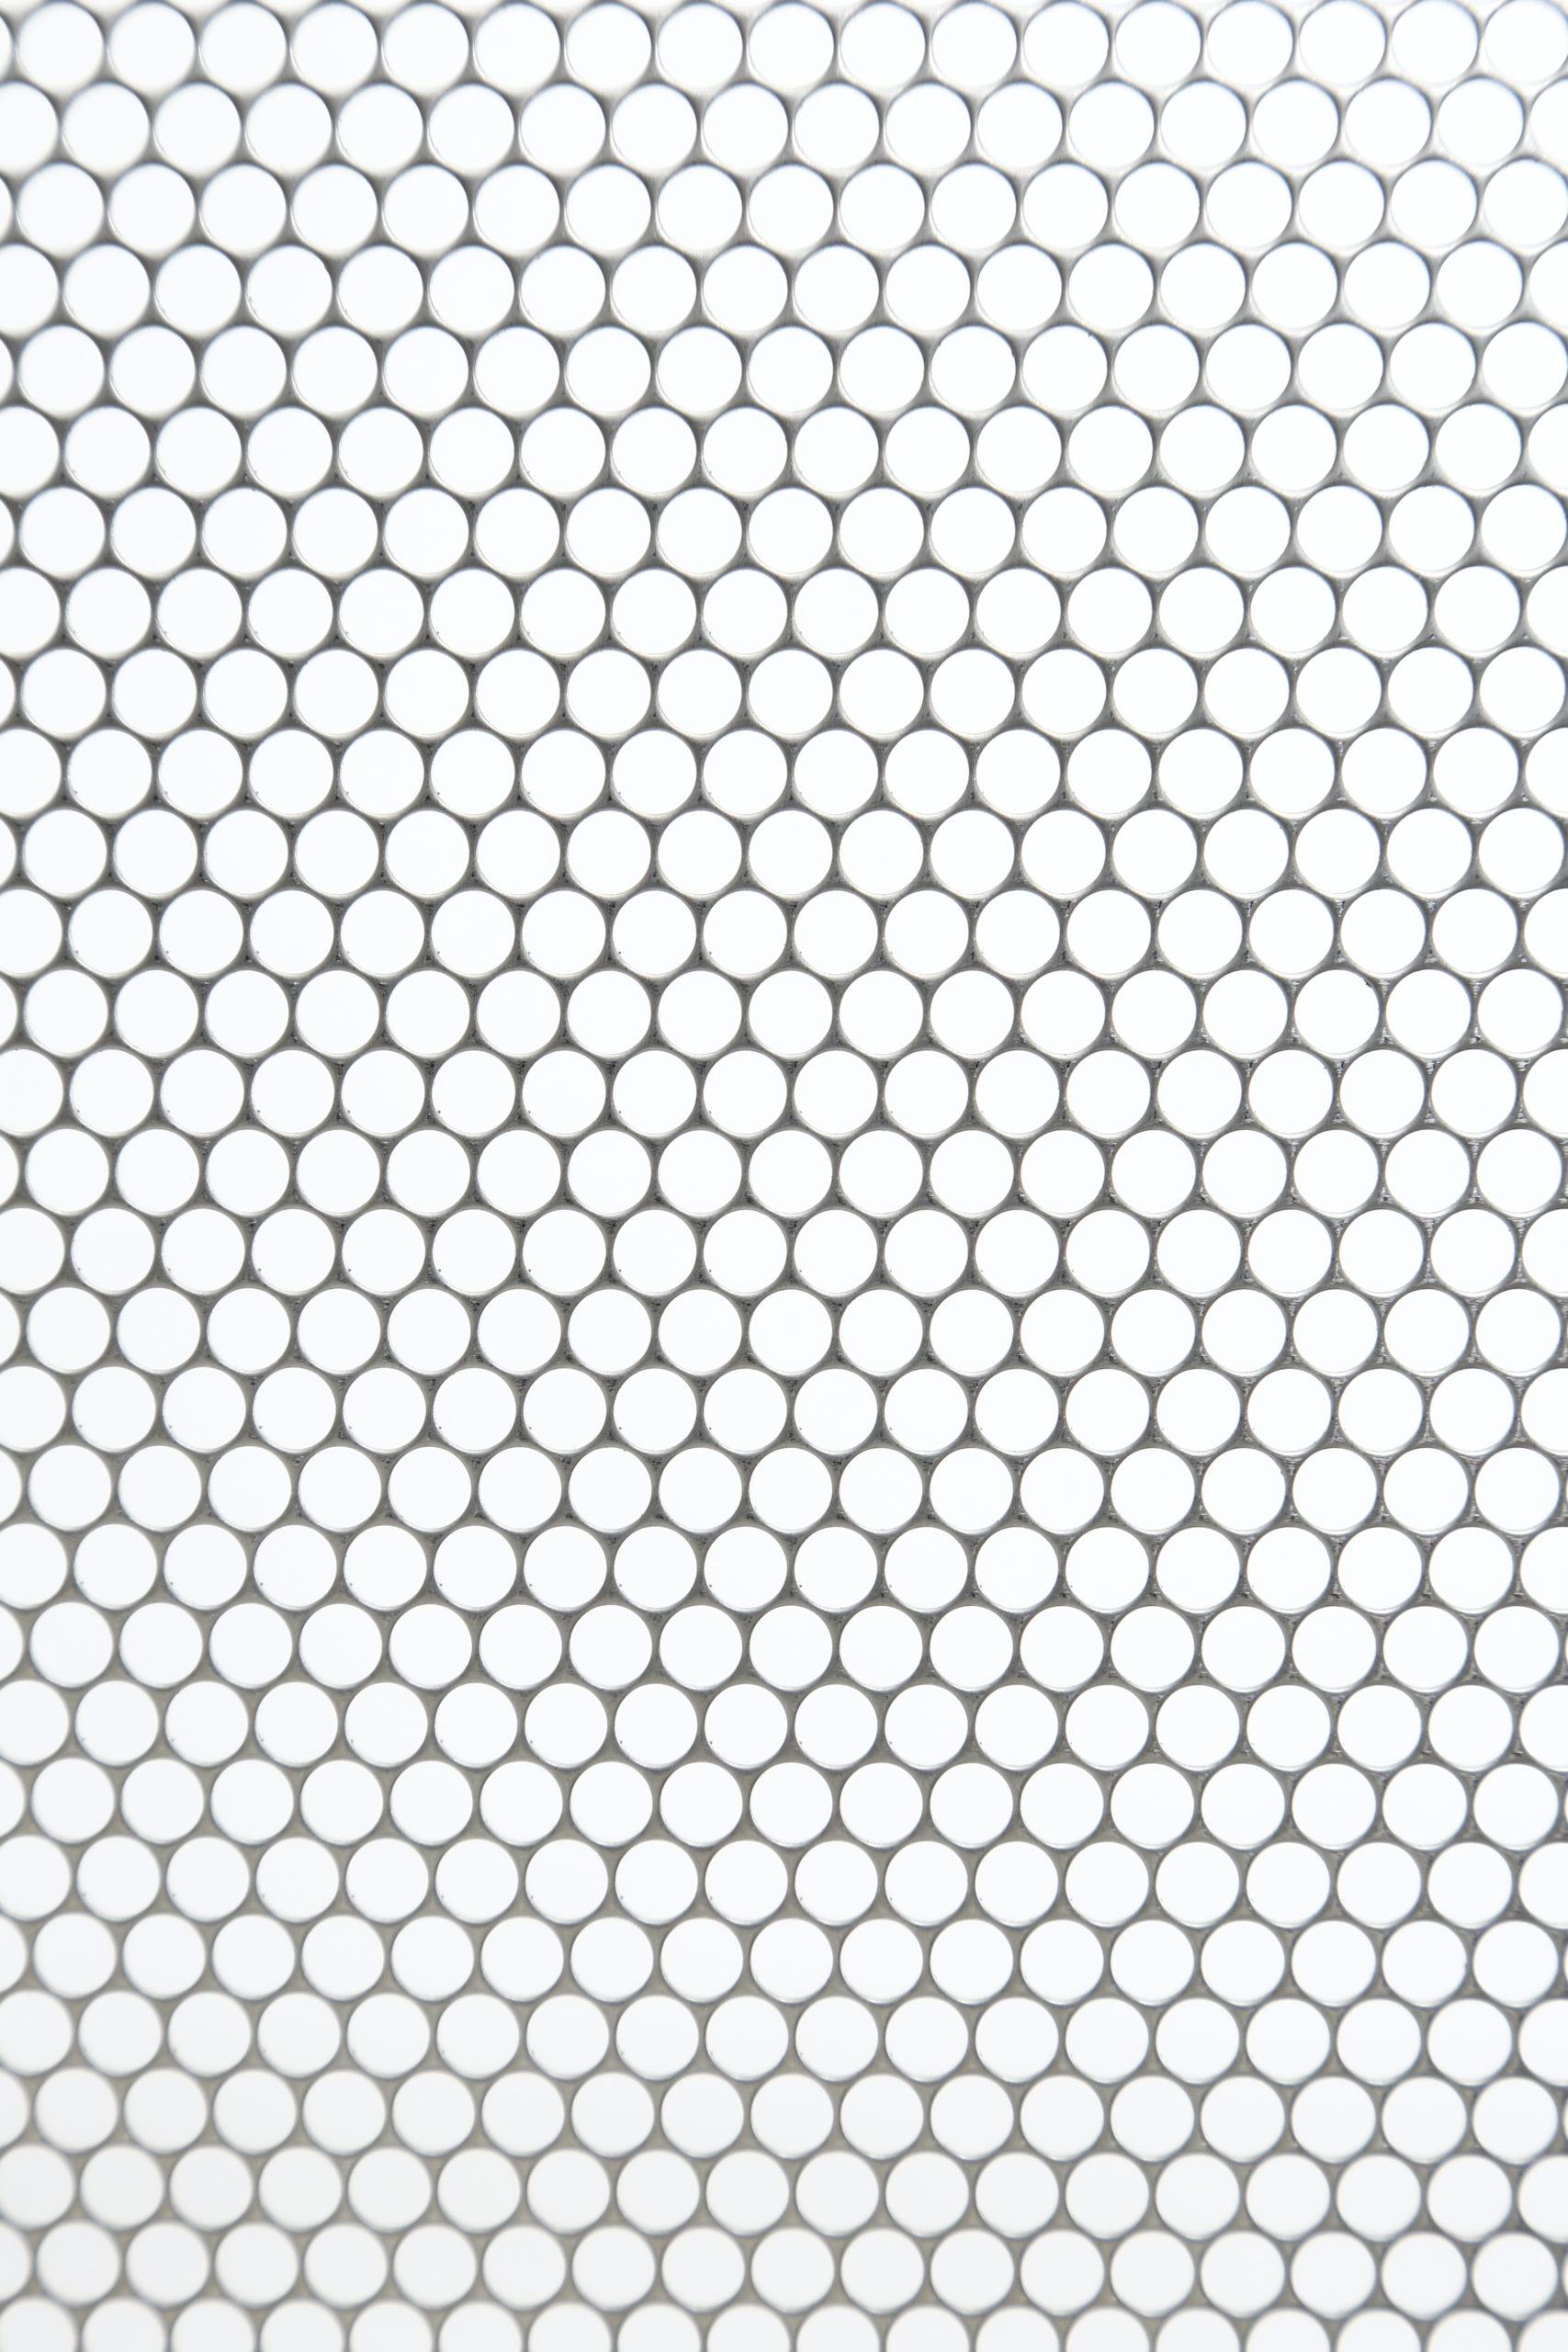 SUS 304-2B t1.0 丸孔 D5×P5.5 60°チドリ 開口率:74.9%